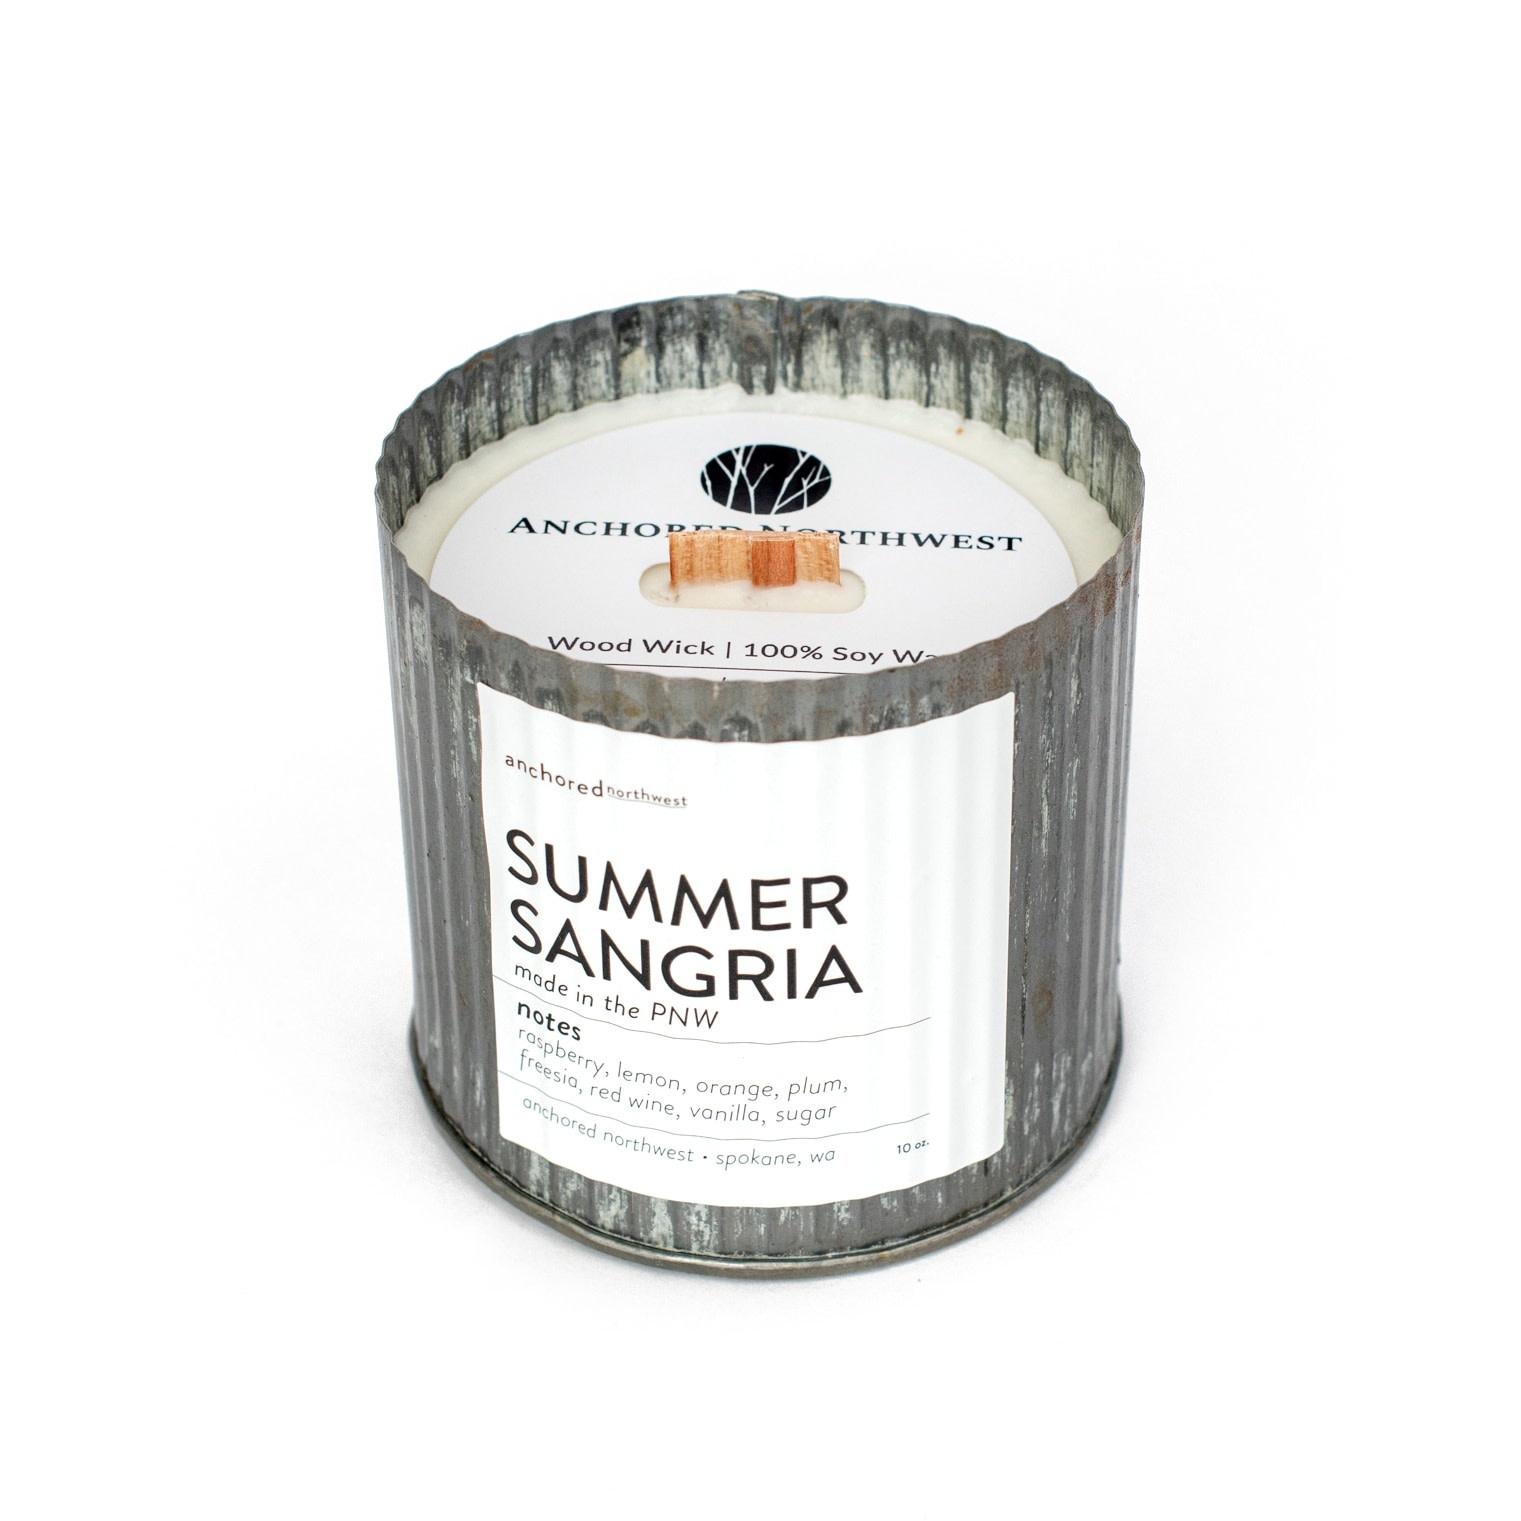 Summer Sangria 10oz Candle